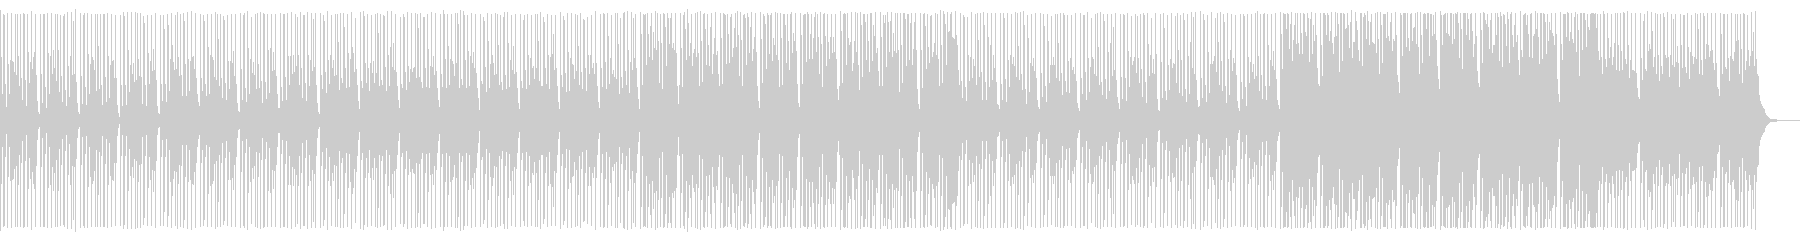 ScienceLaboの未再生の波形